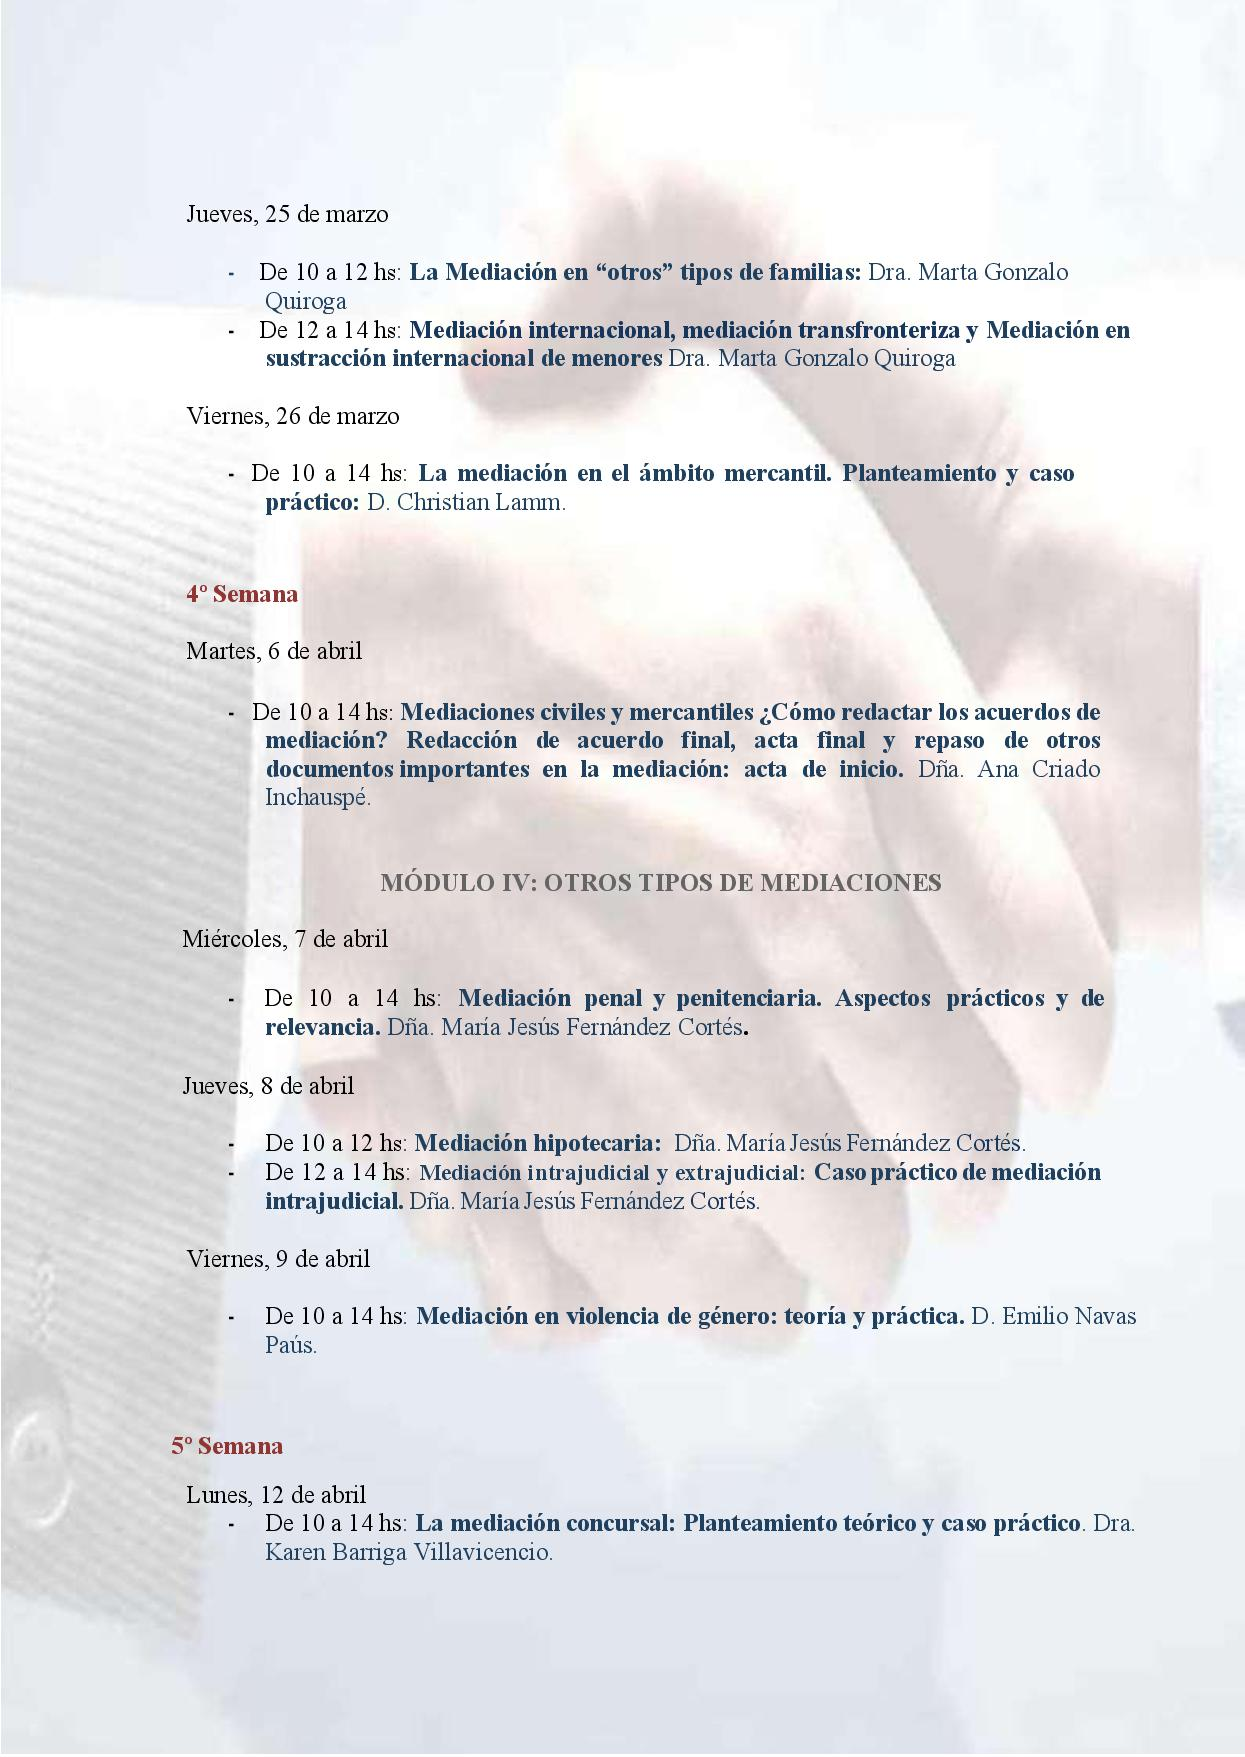 Programa-page-004